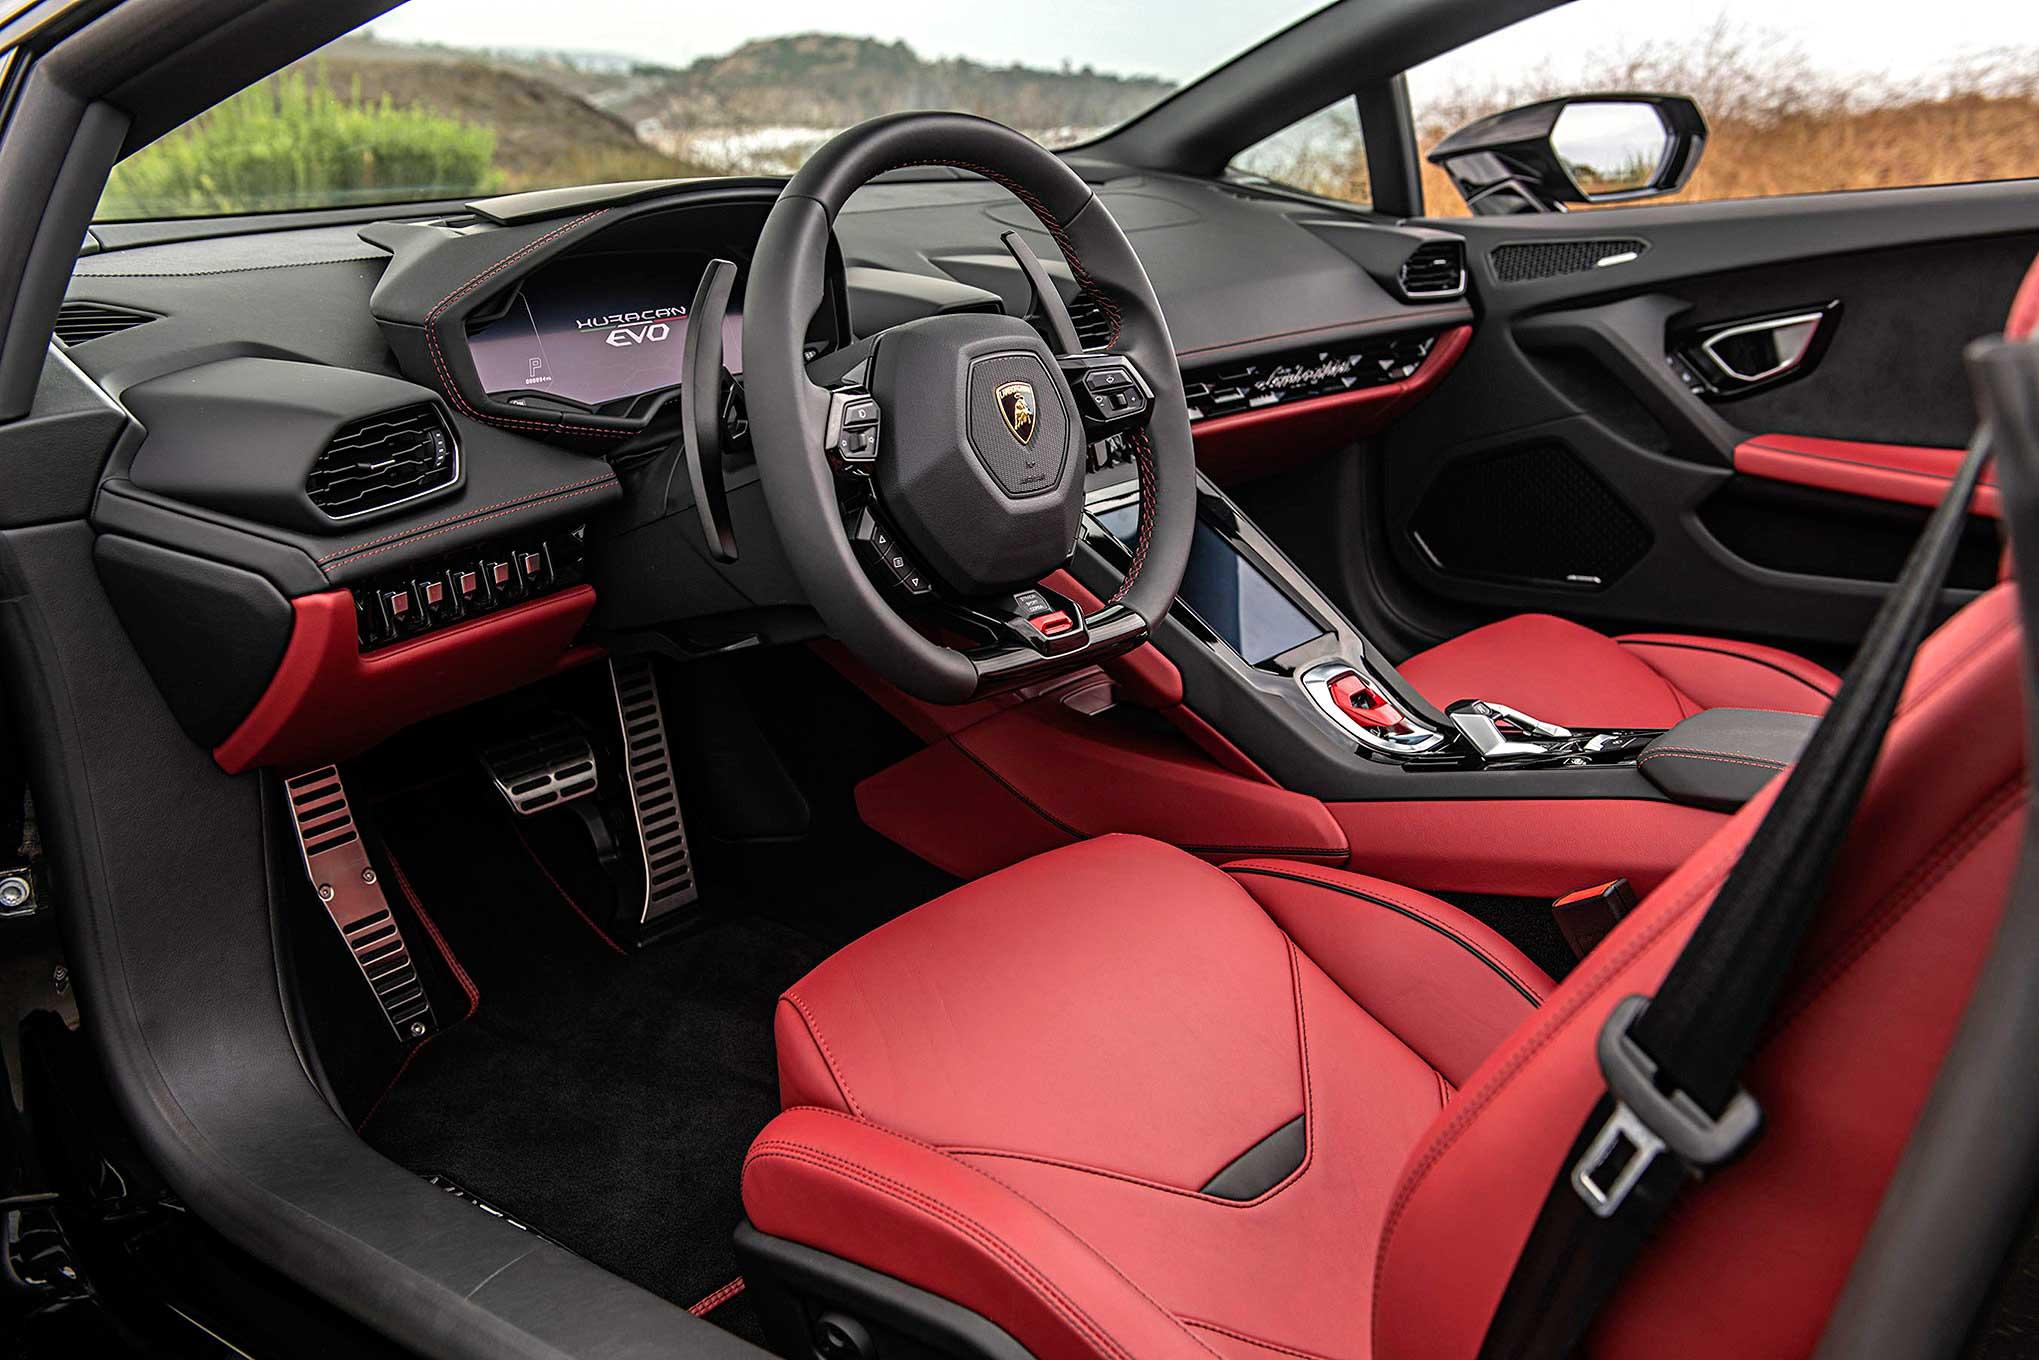 On the Road 2020 Lamborghini Huracan Evo Spyder